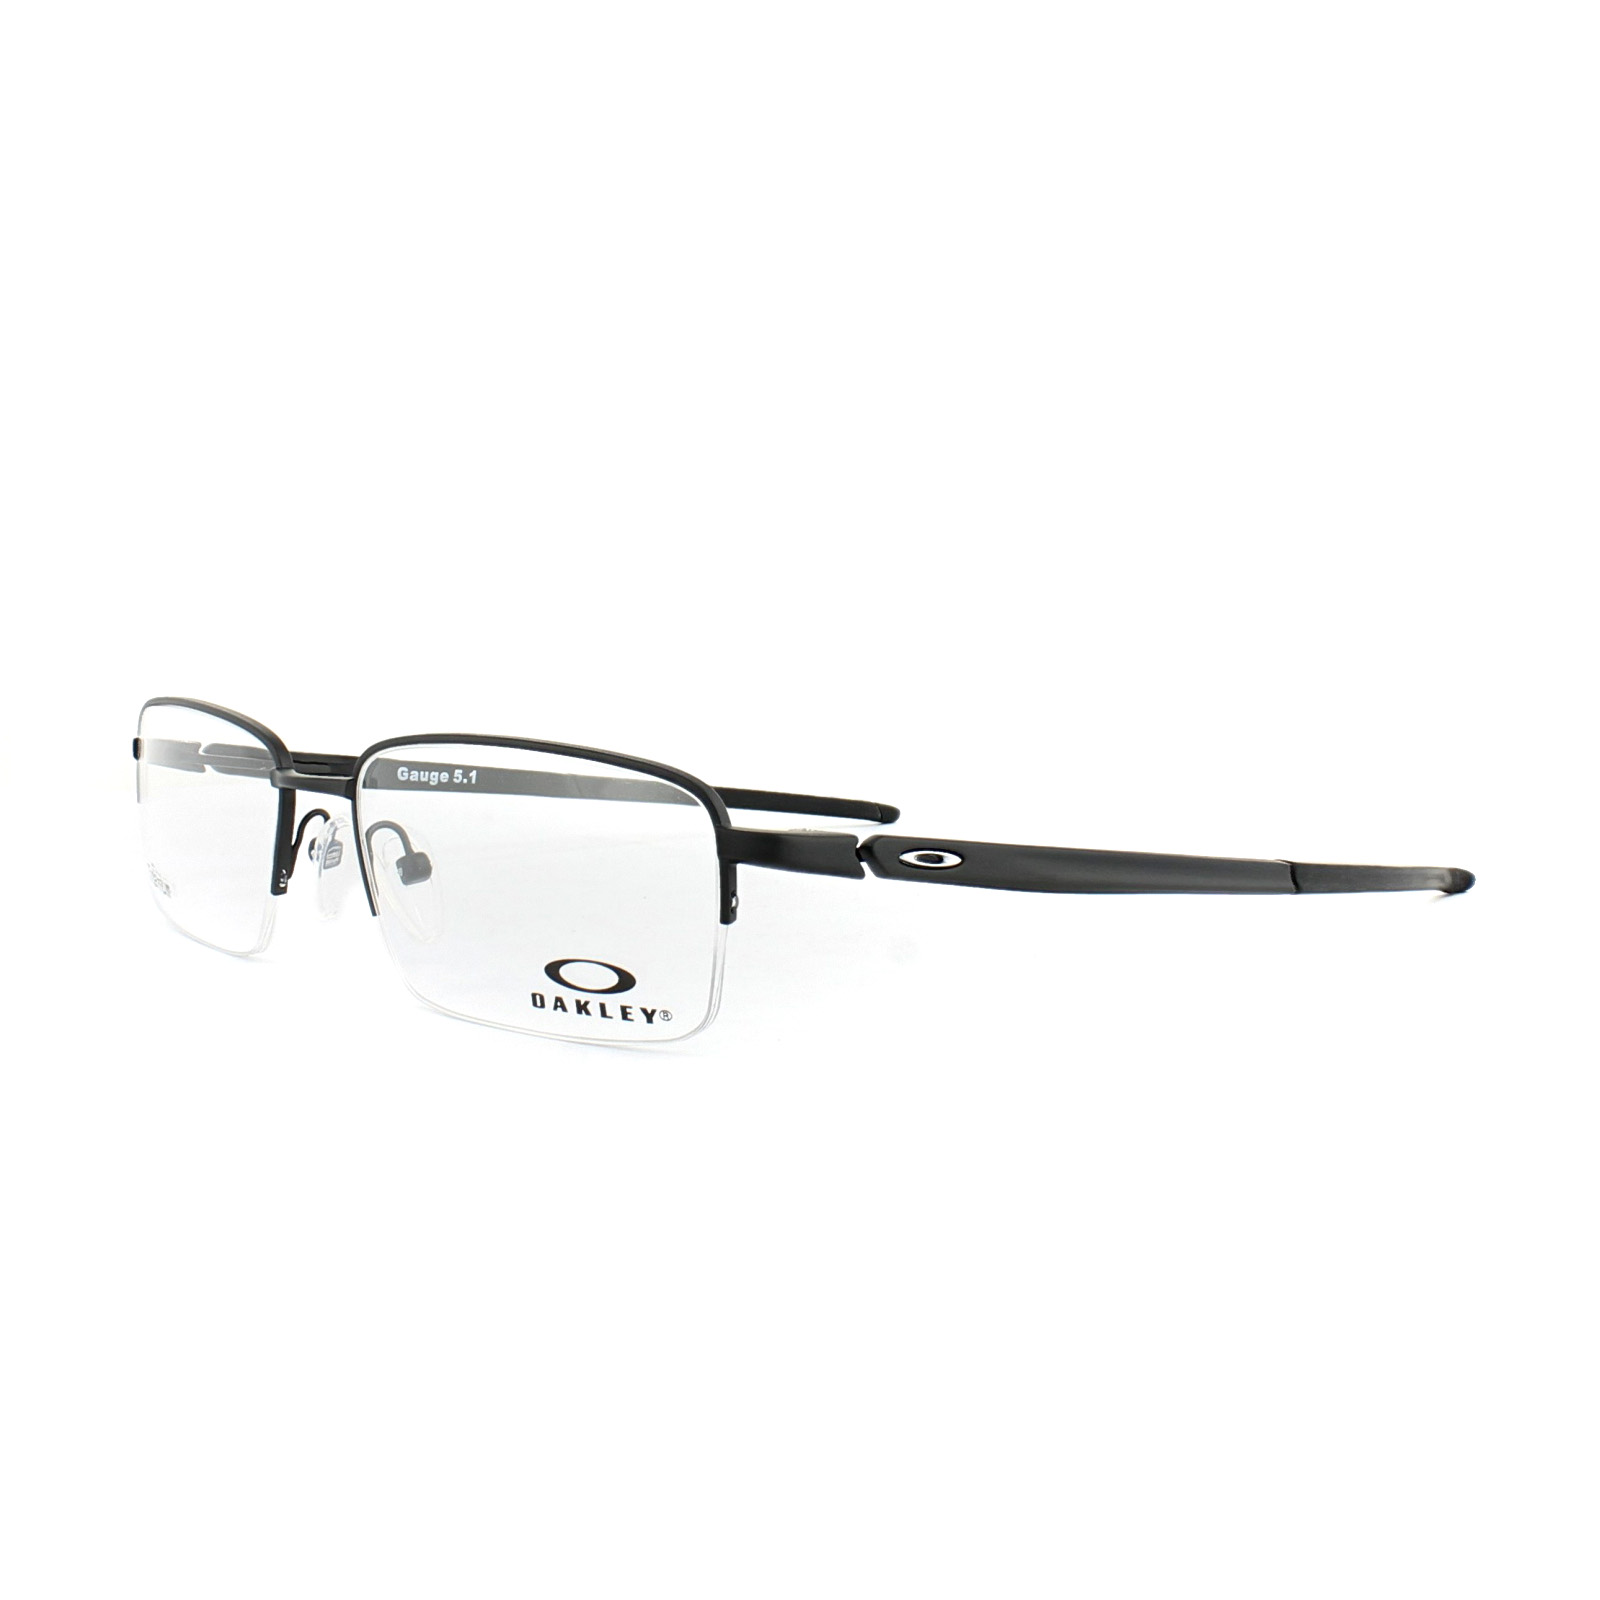 Oakley Monturas De Gafas Medidor 5.1 ox5125-01 54 NEGRO MATE HOMBRE ...